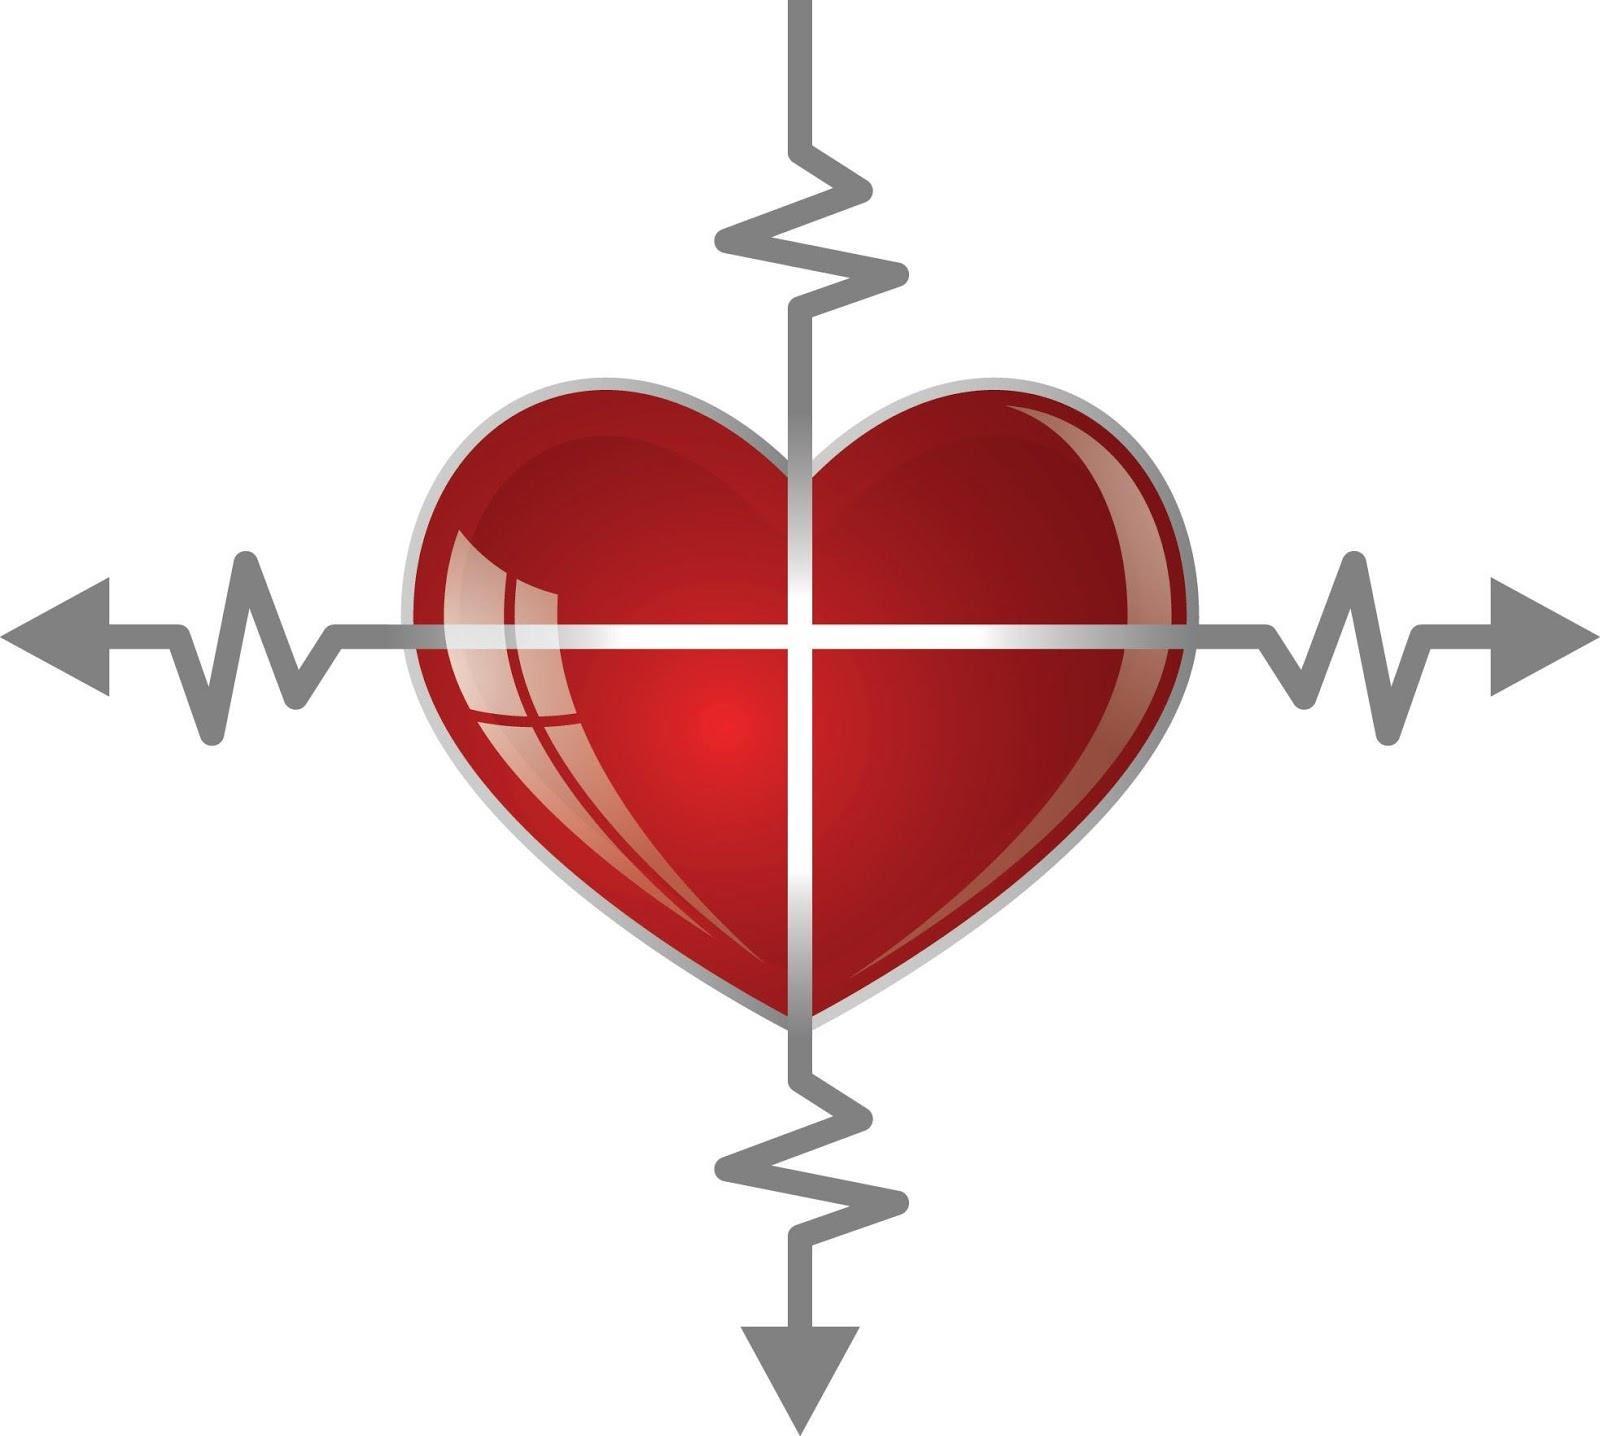 FFL Heart.jpg